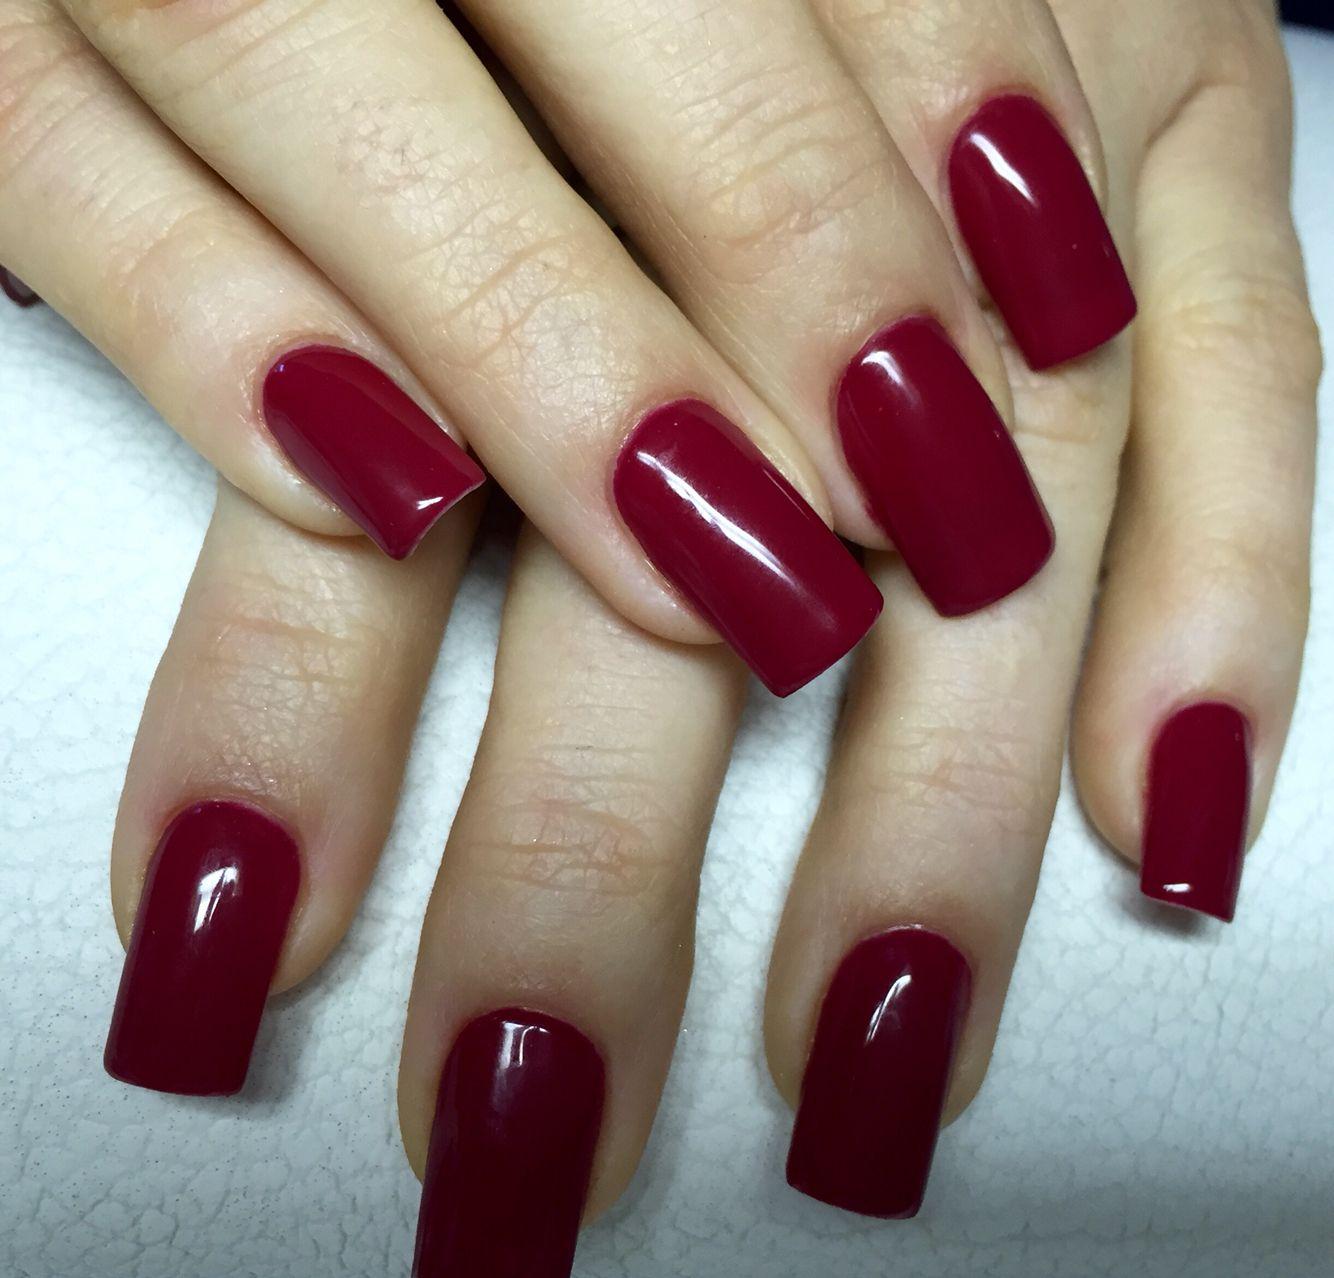 Rot#klassisch#long#nails# | Nails, Wimpernextensions, Finger